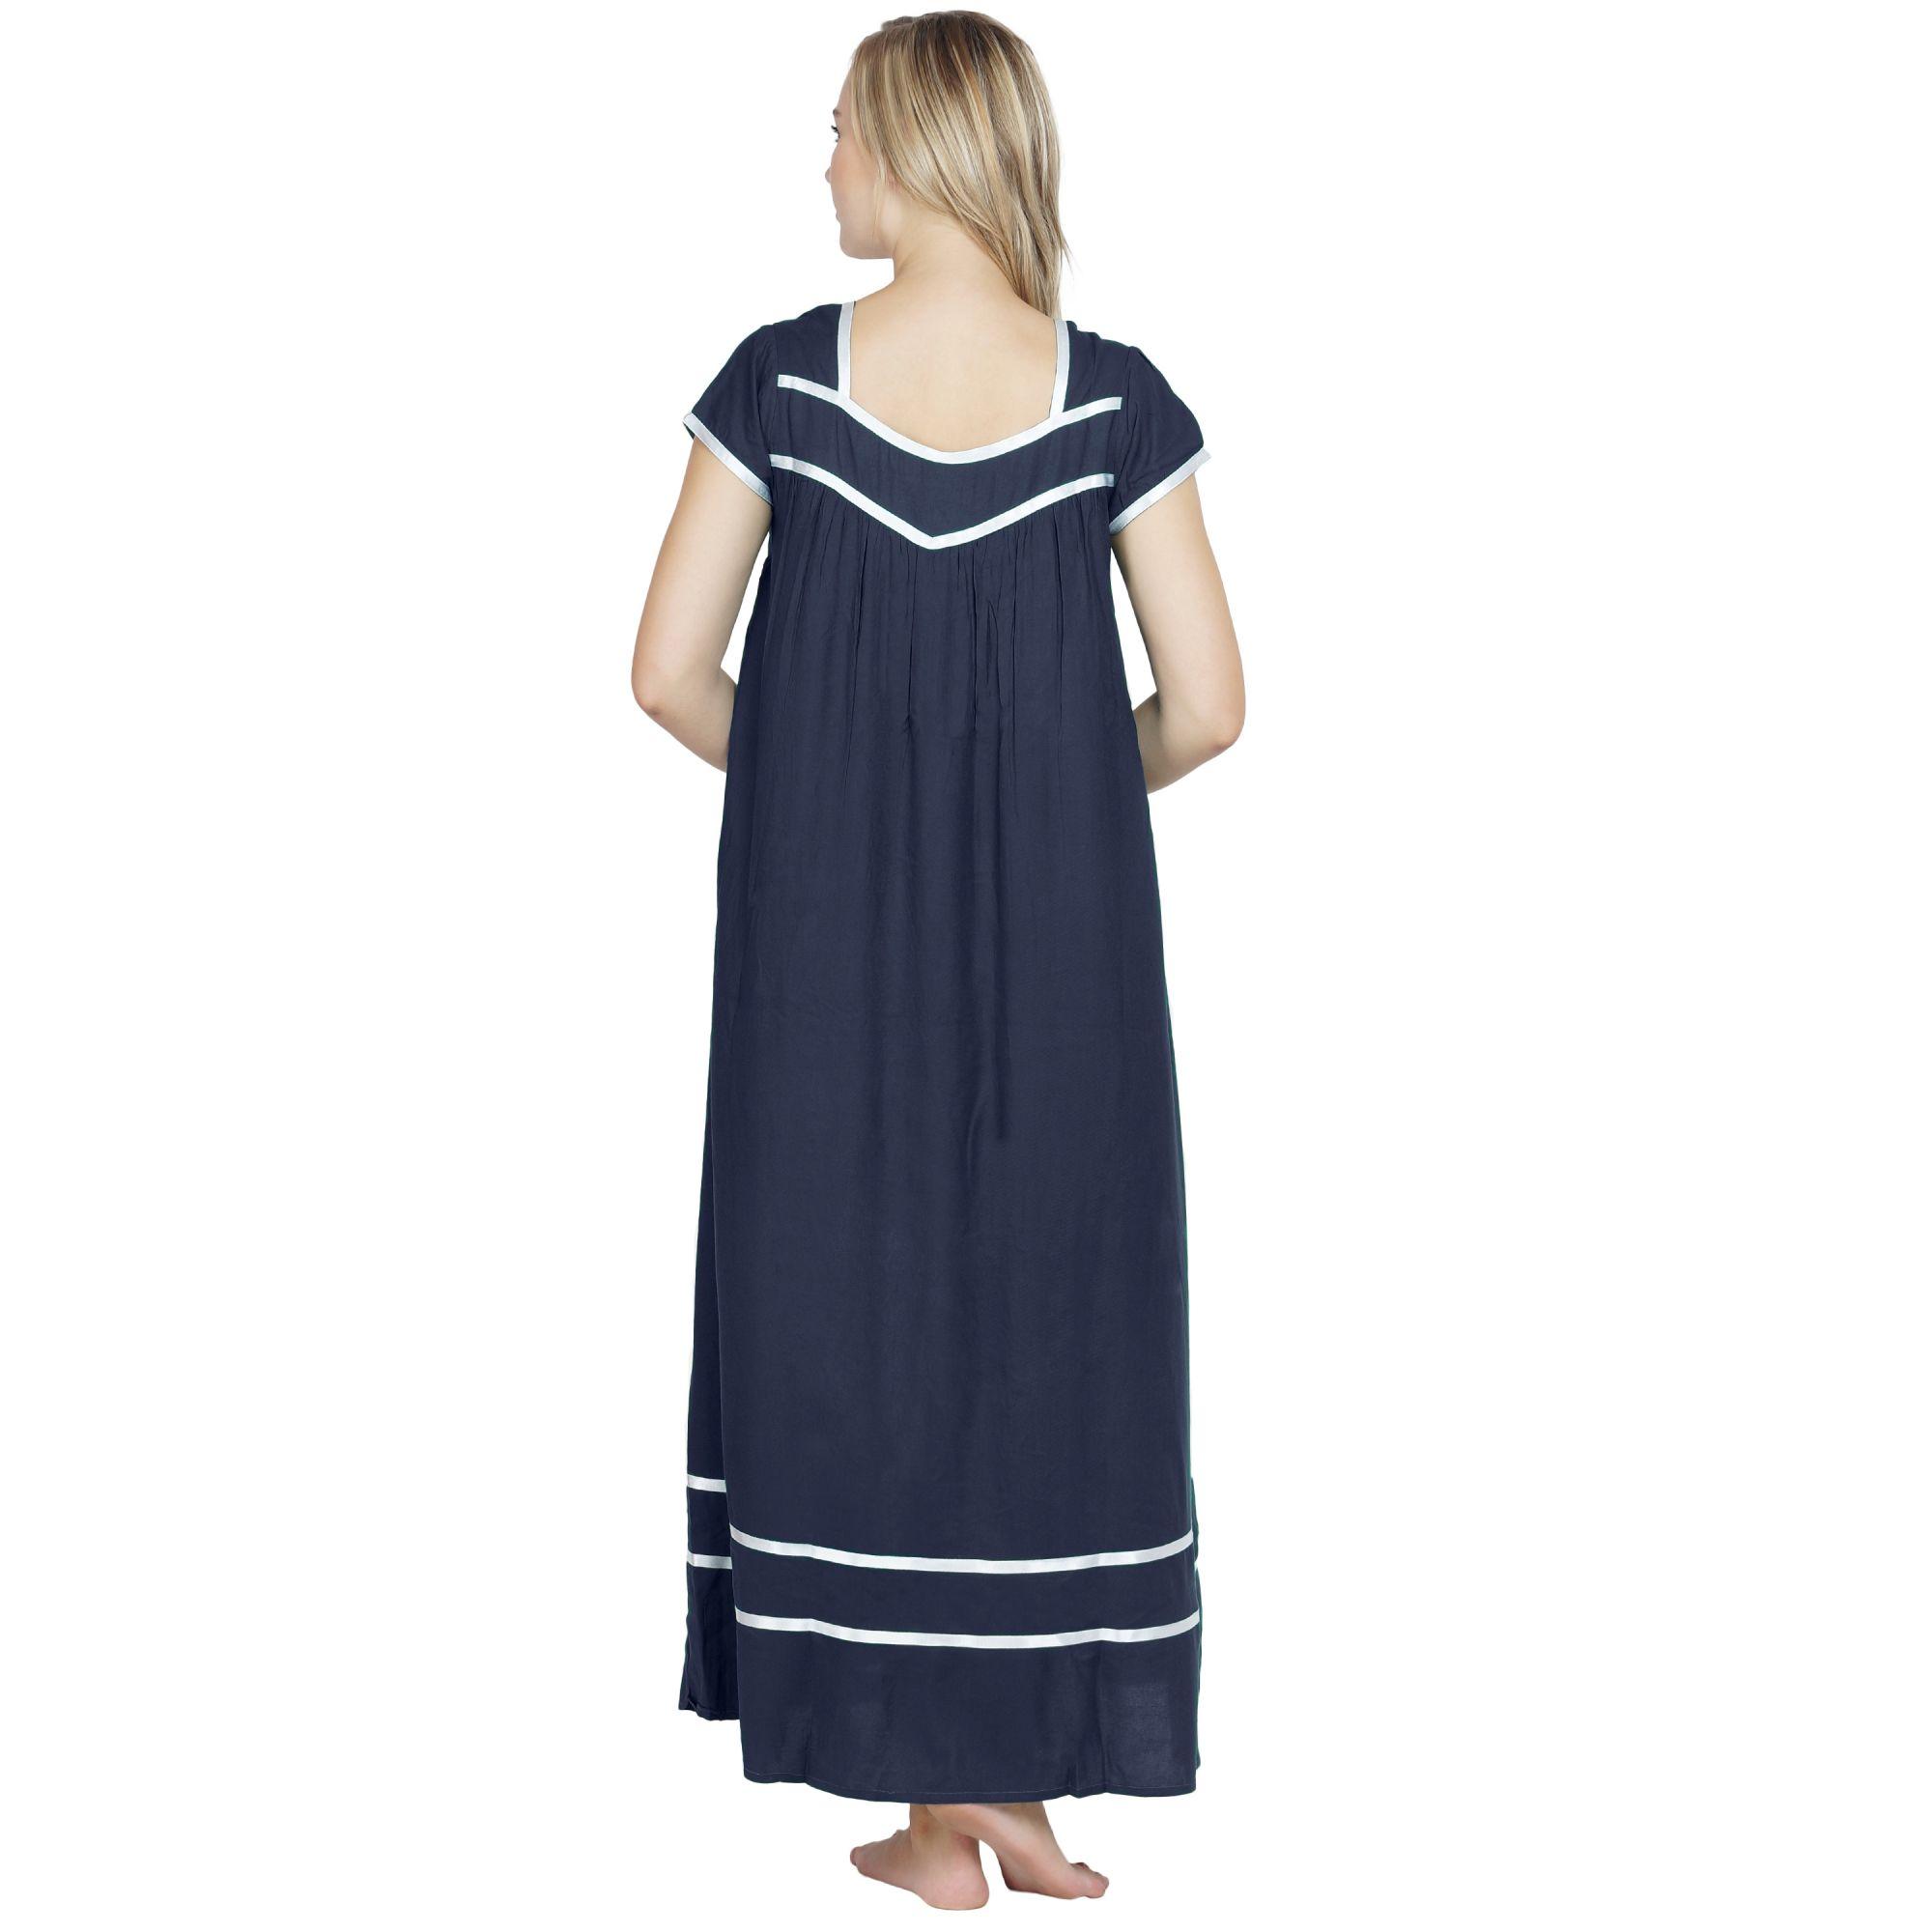 Embellished Stylish Front Zip Nighty in Dark Blue